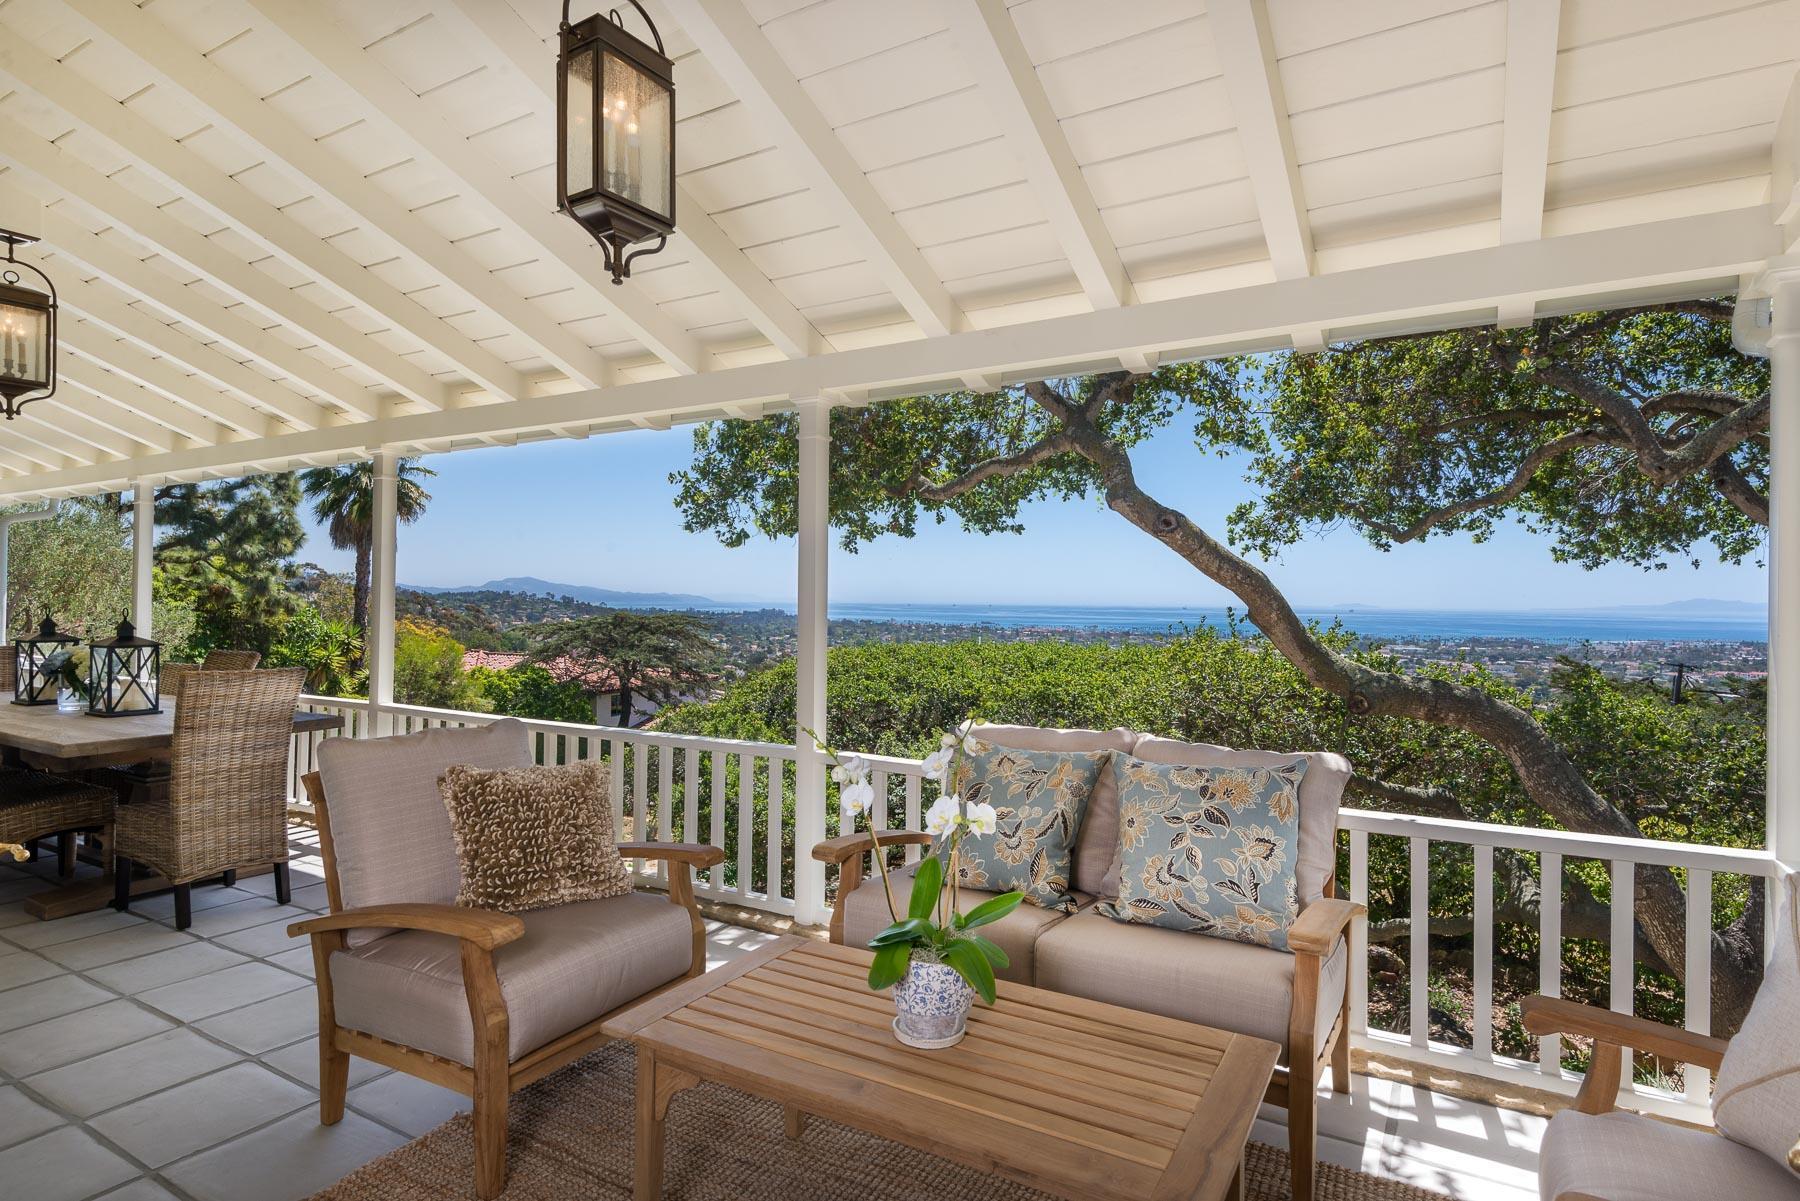 Property photo for 891 Jimeno Rd Santa Barbara, California 93103 - 15-1401